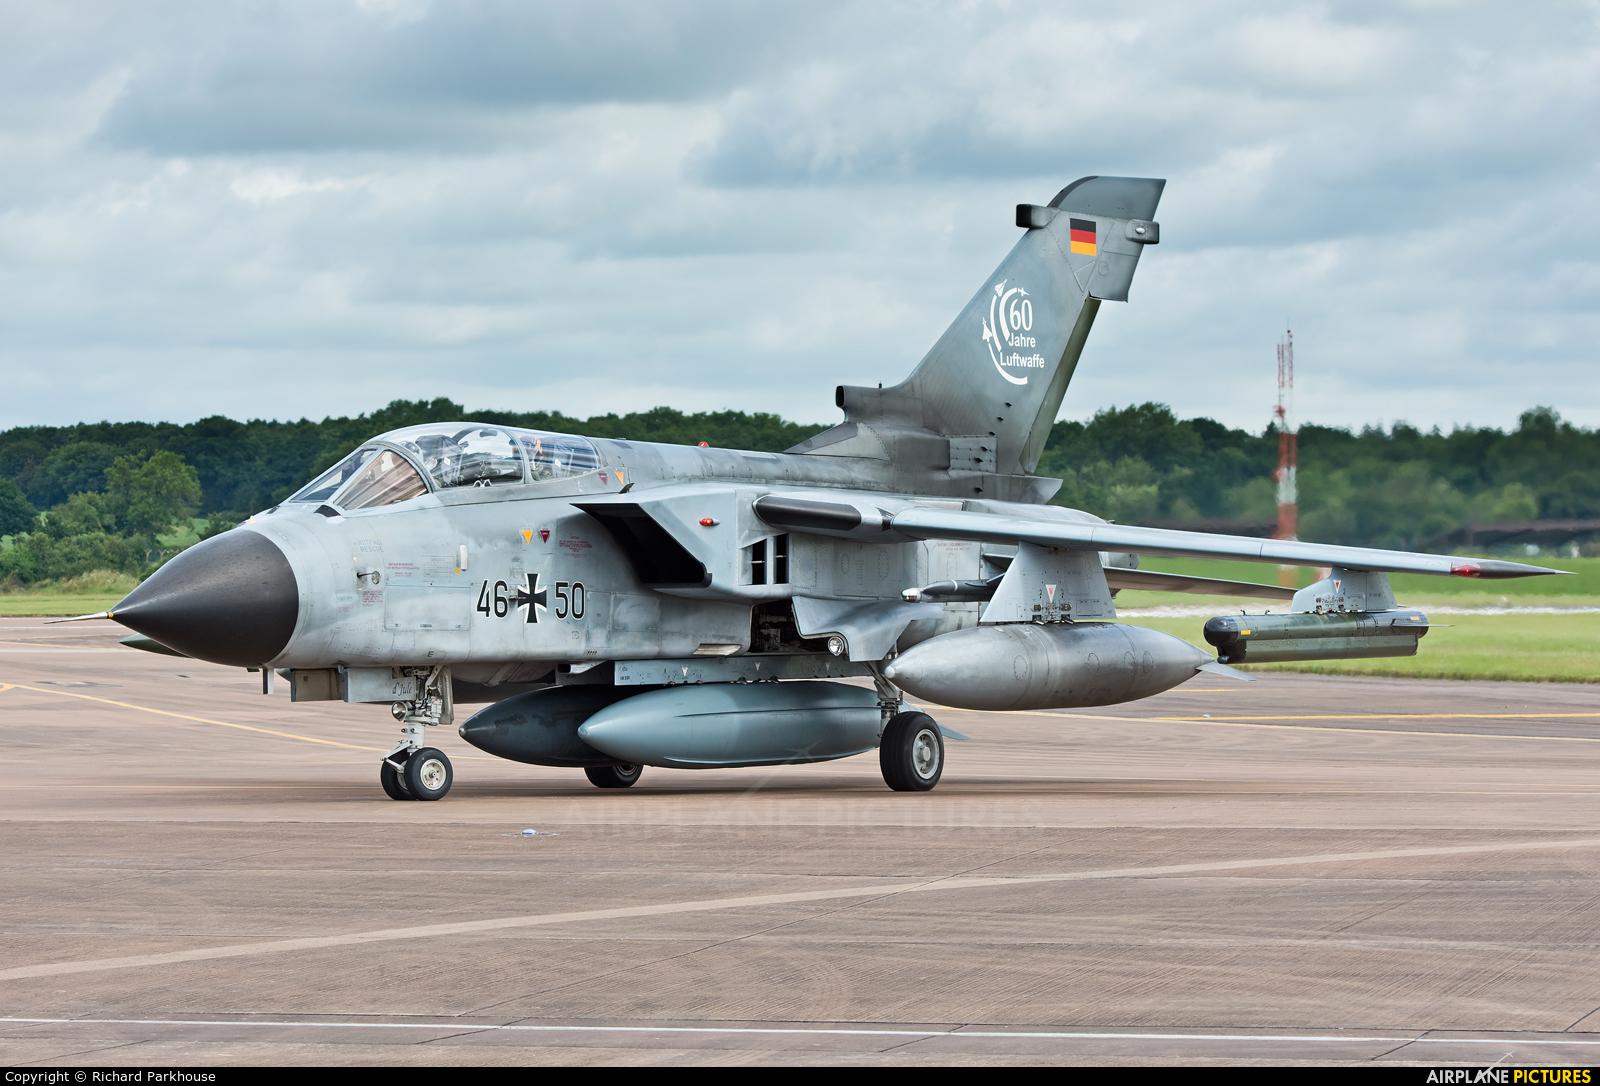 Germany - Air Force 46+50 aircraft at Fairford